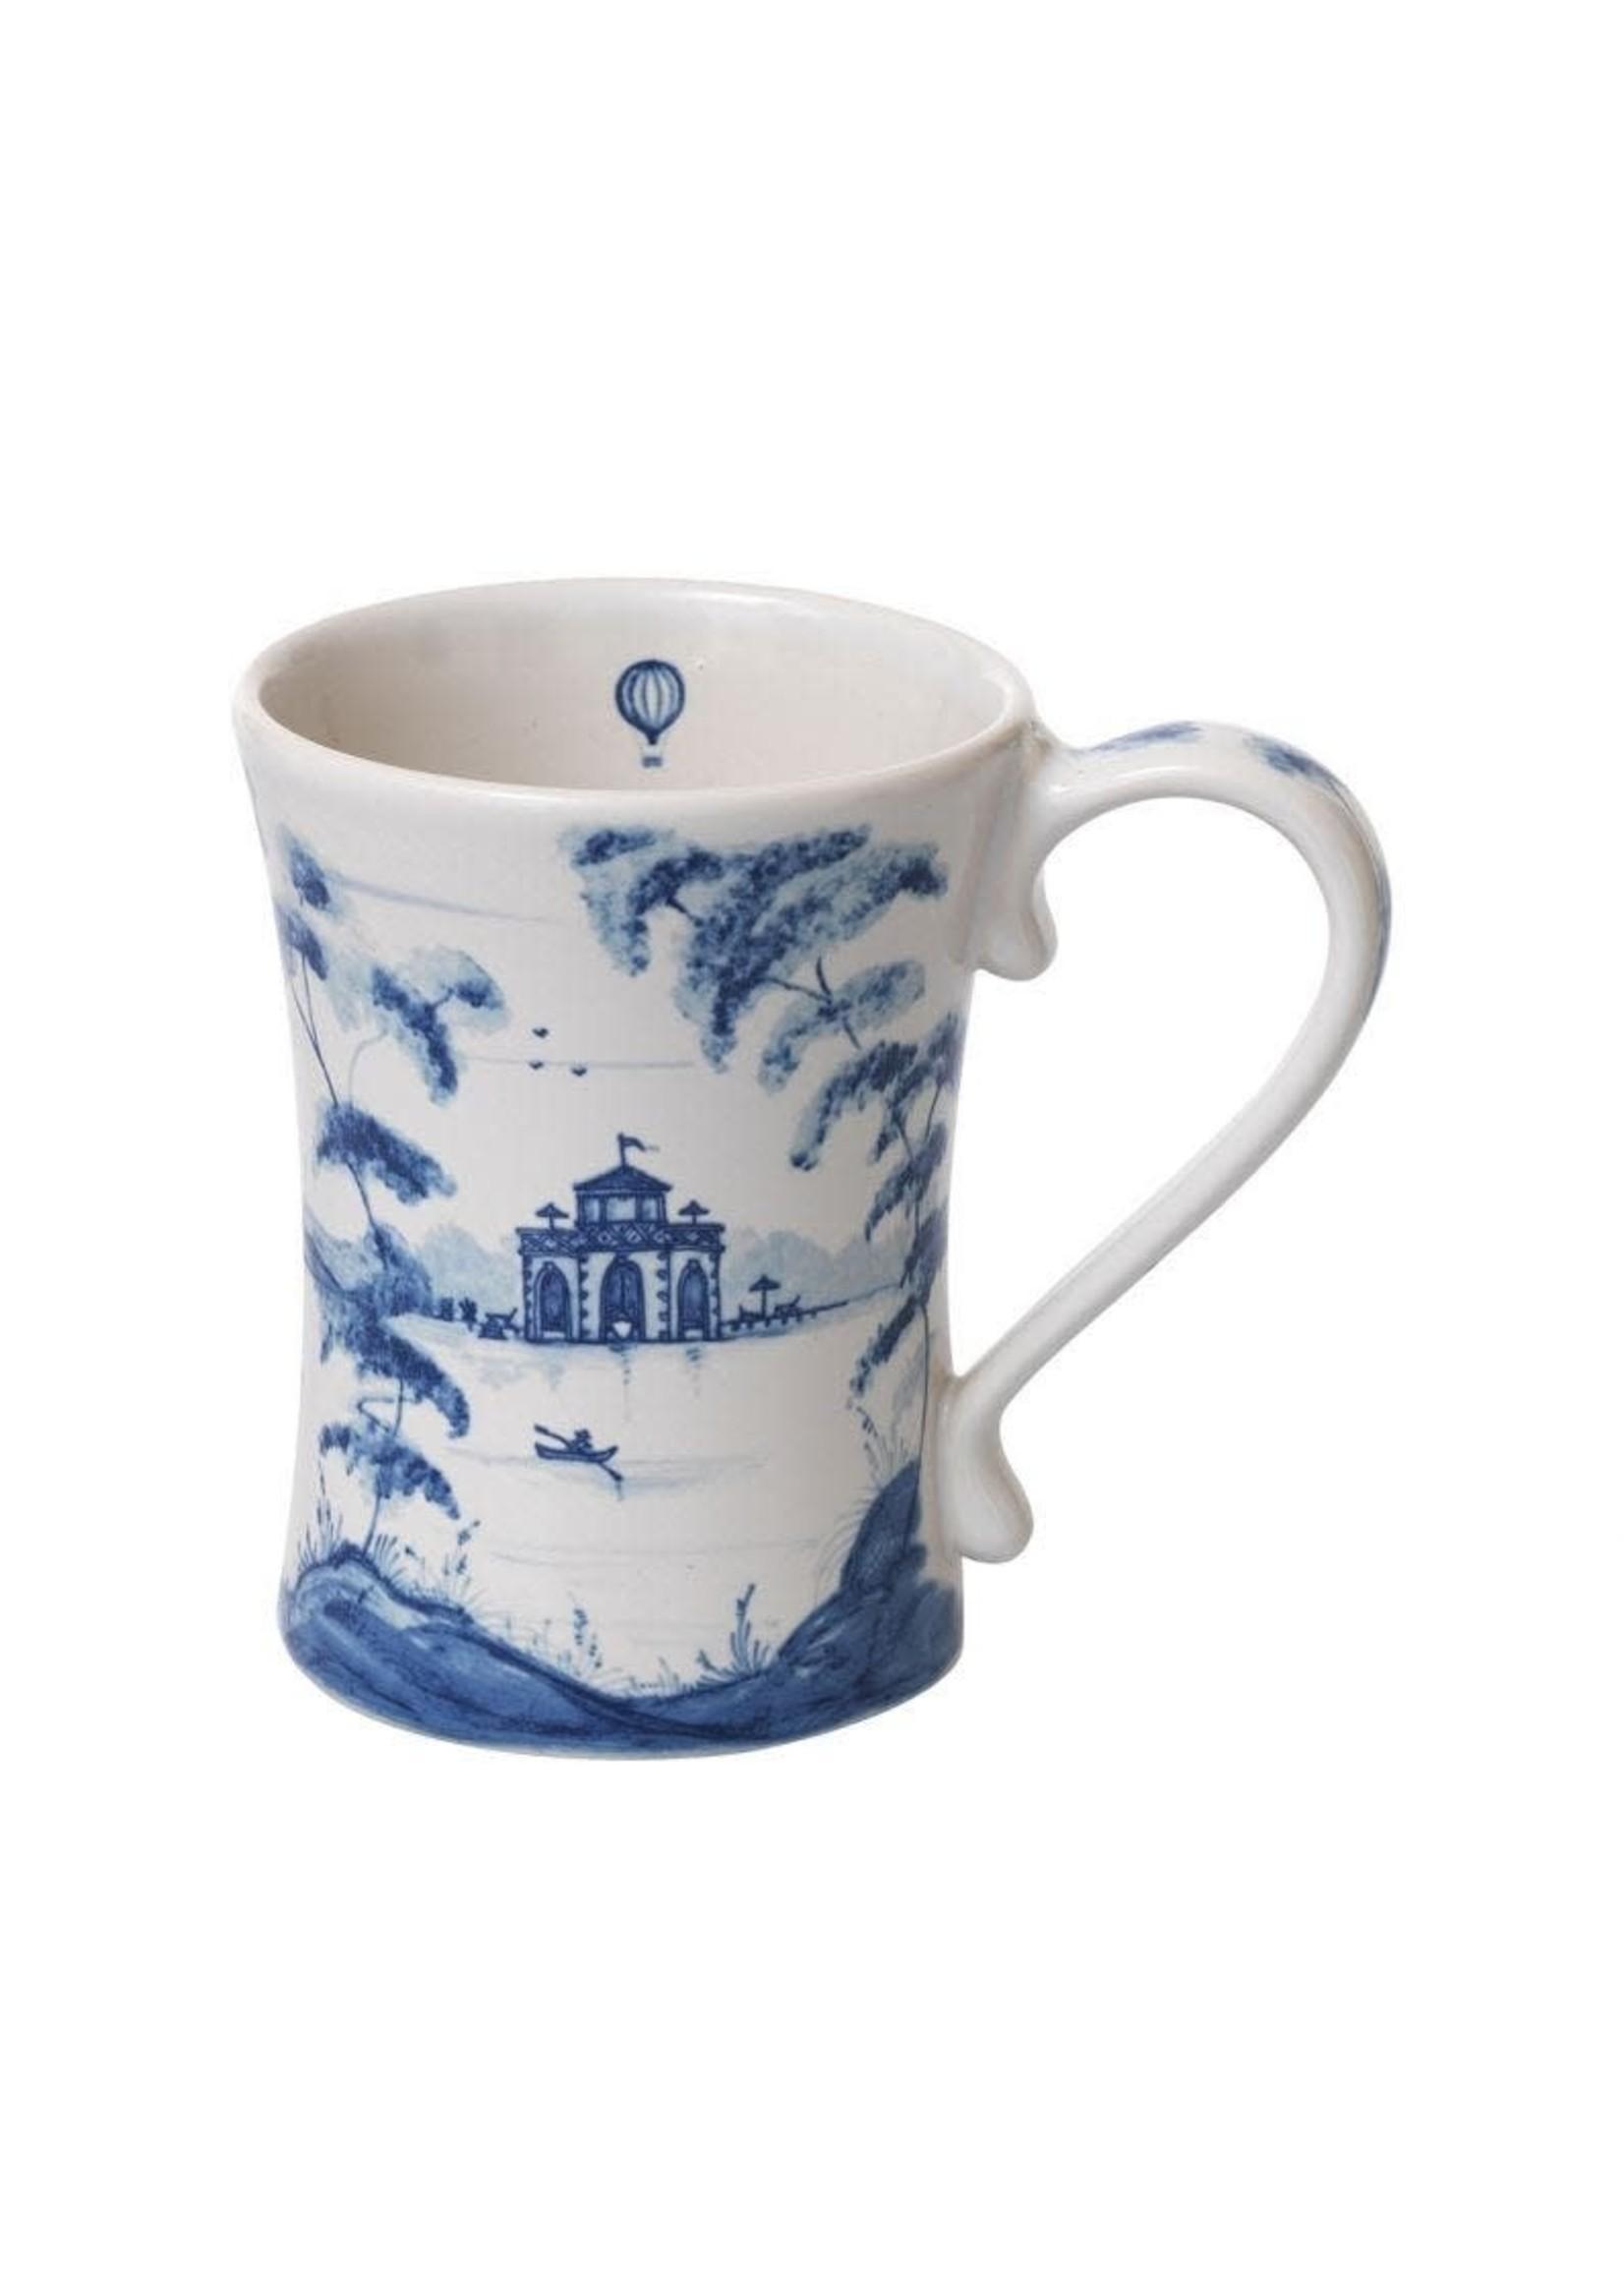 Juliska Country Estate Delft Mug